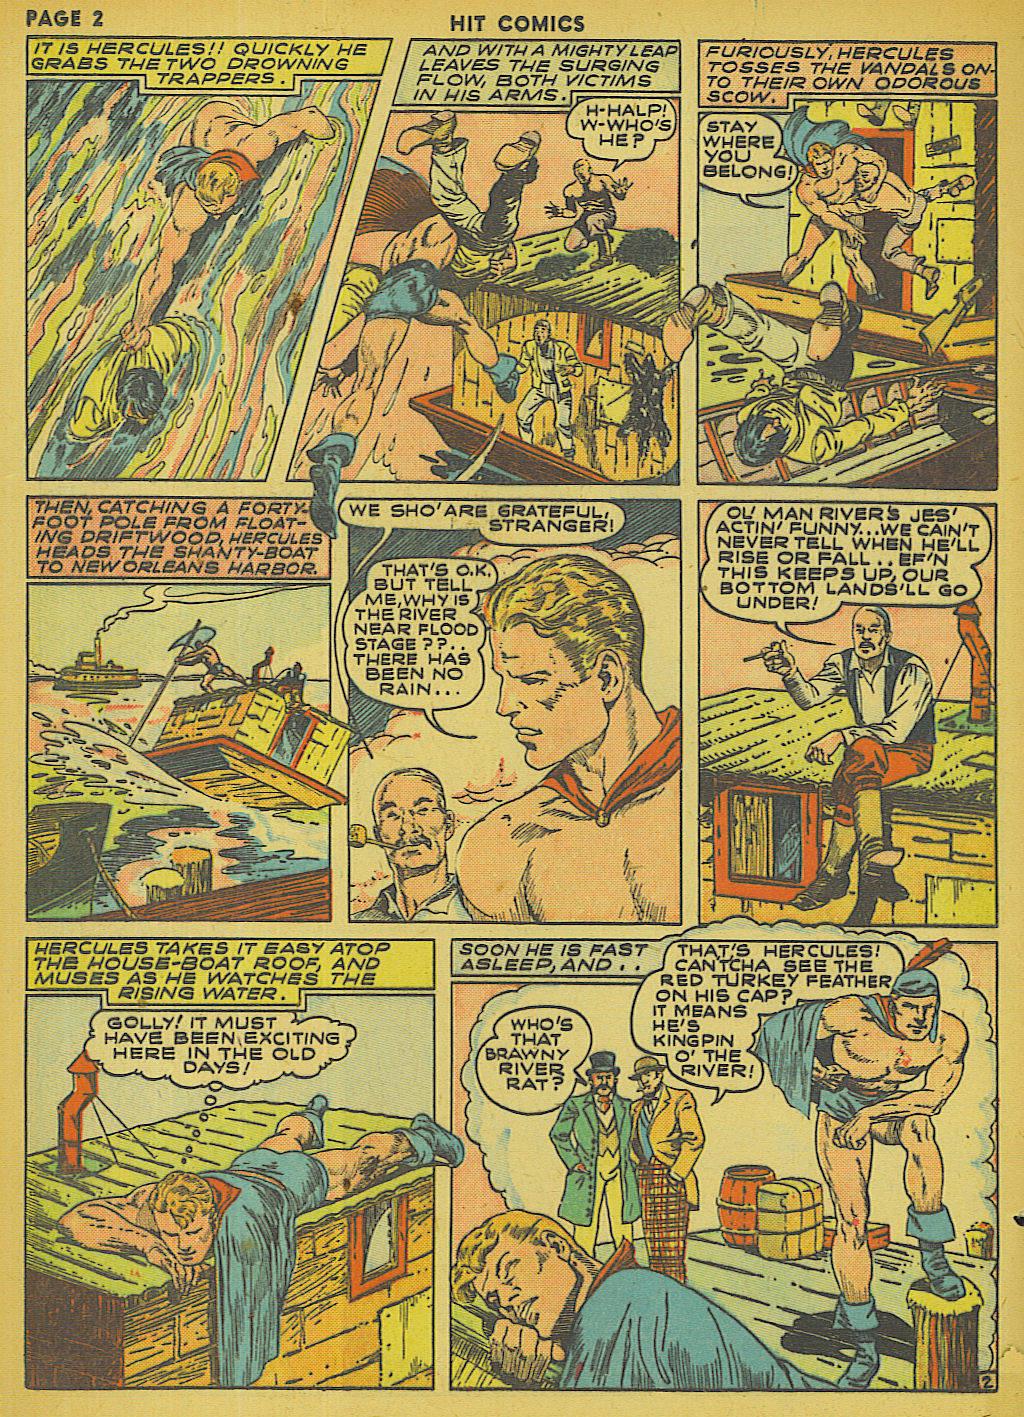 Read online Hit Comics comic -  Issue #13 - 4